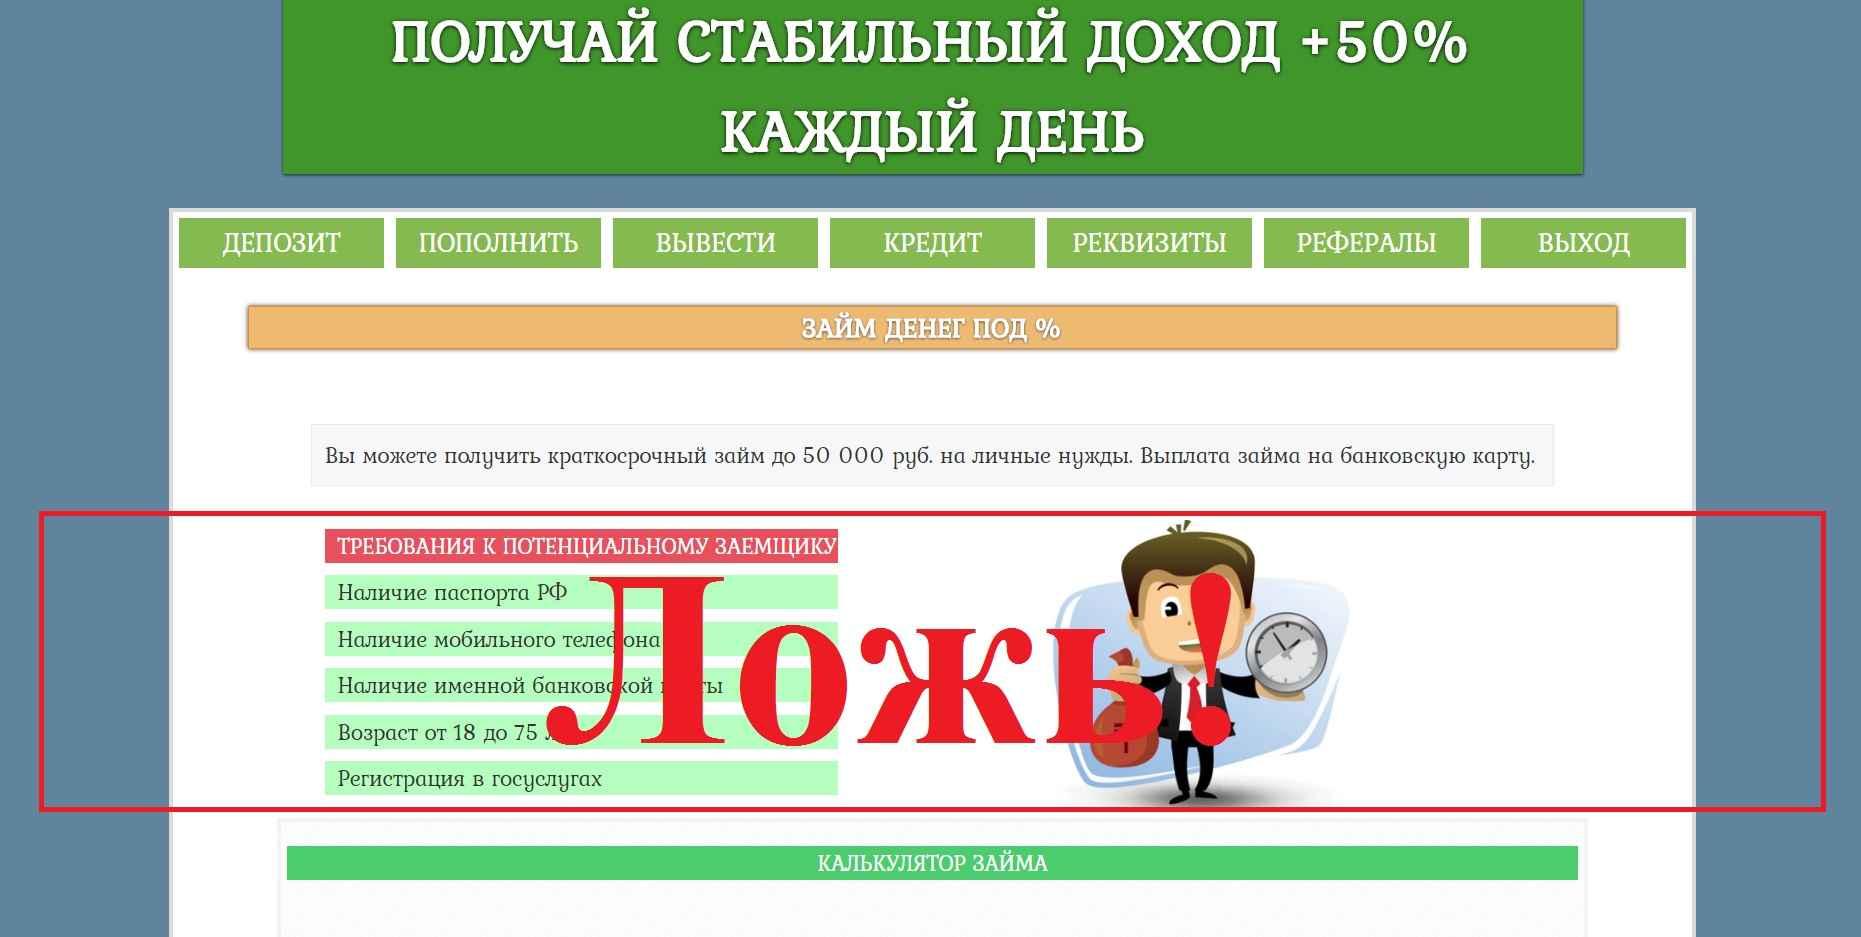 Best-investorn.ru – реальные отзывы